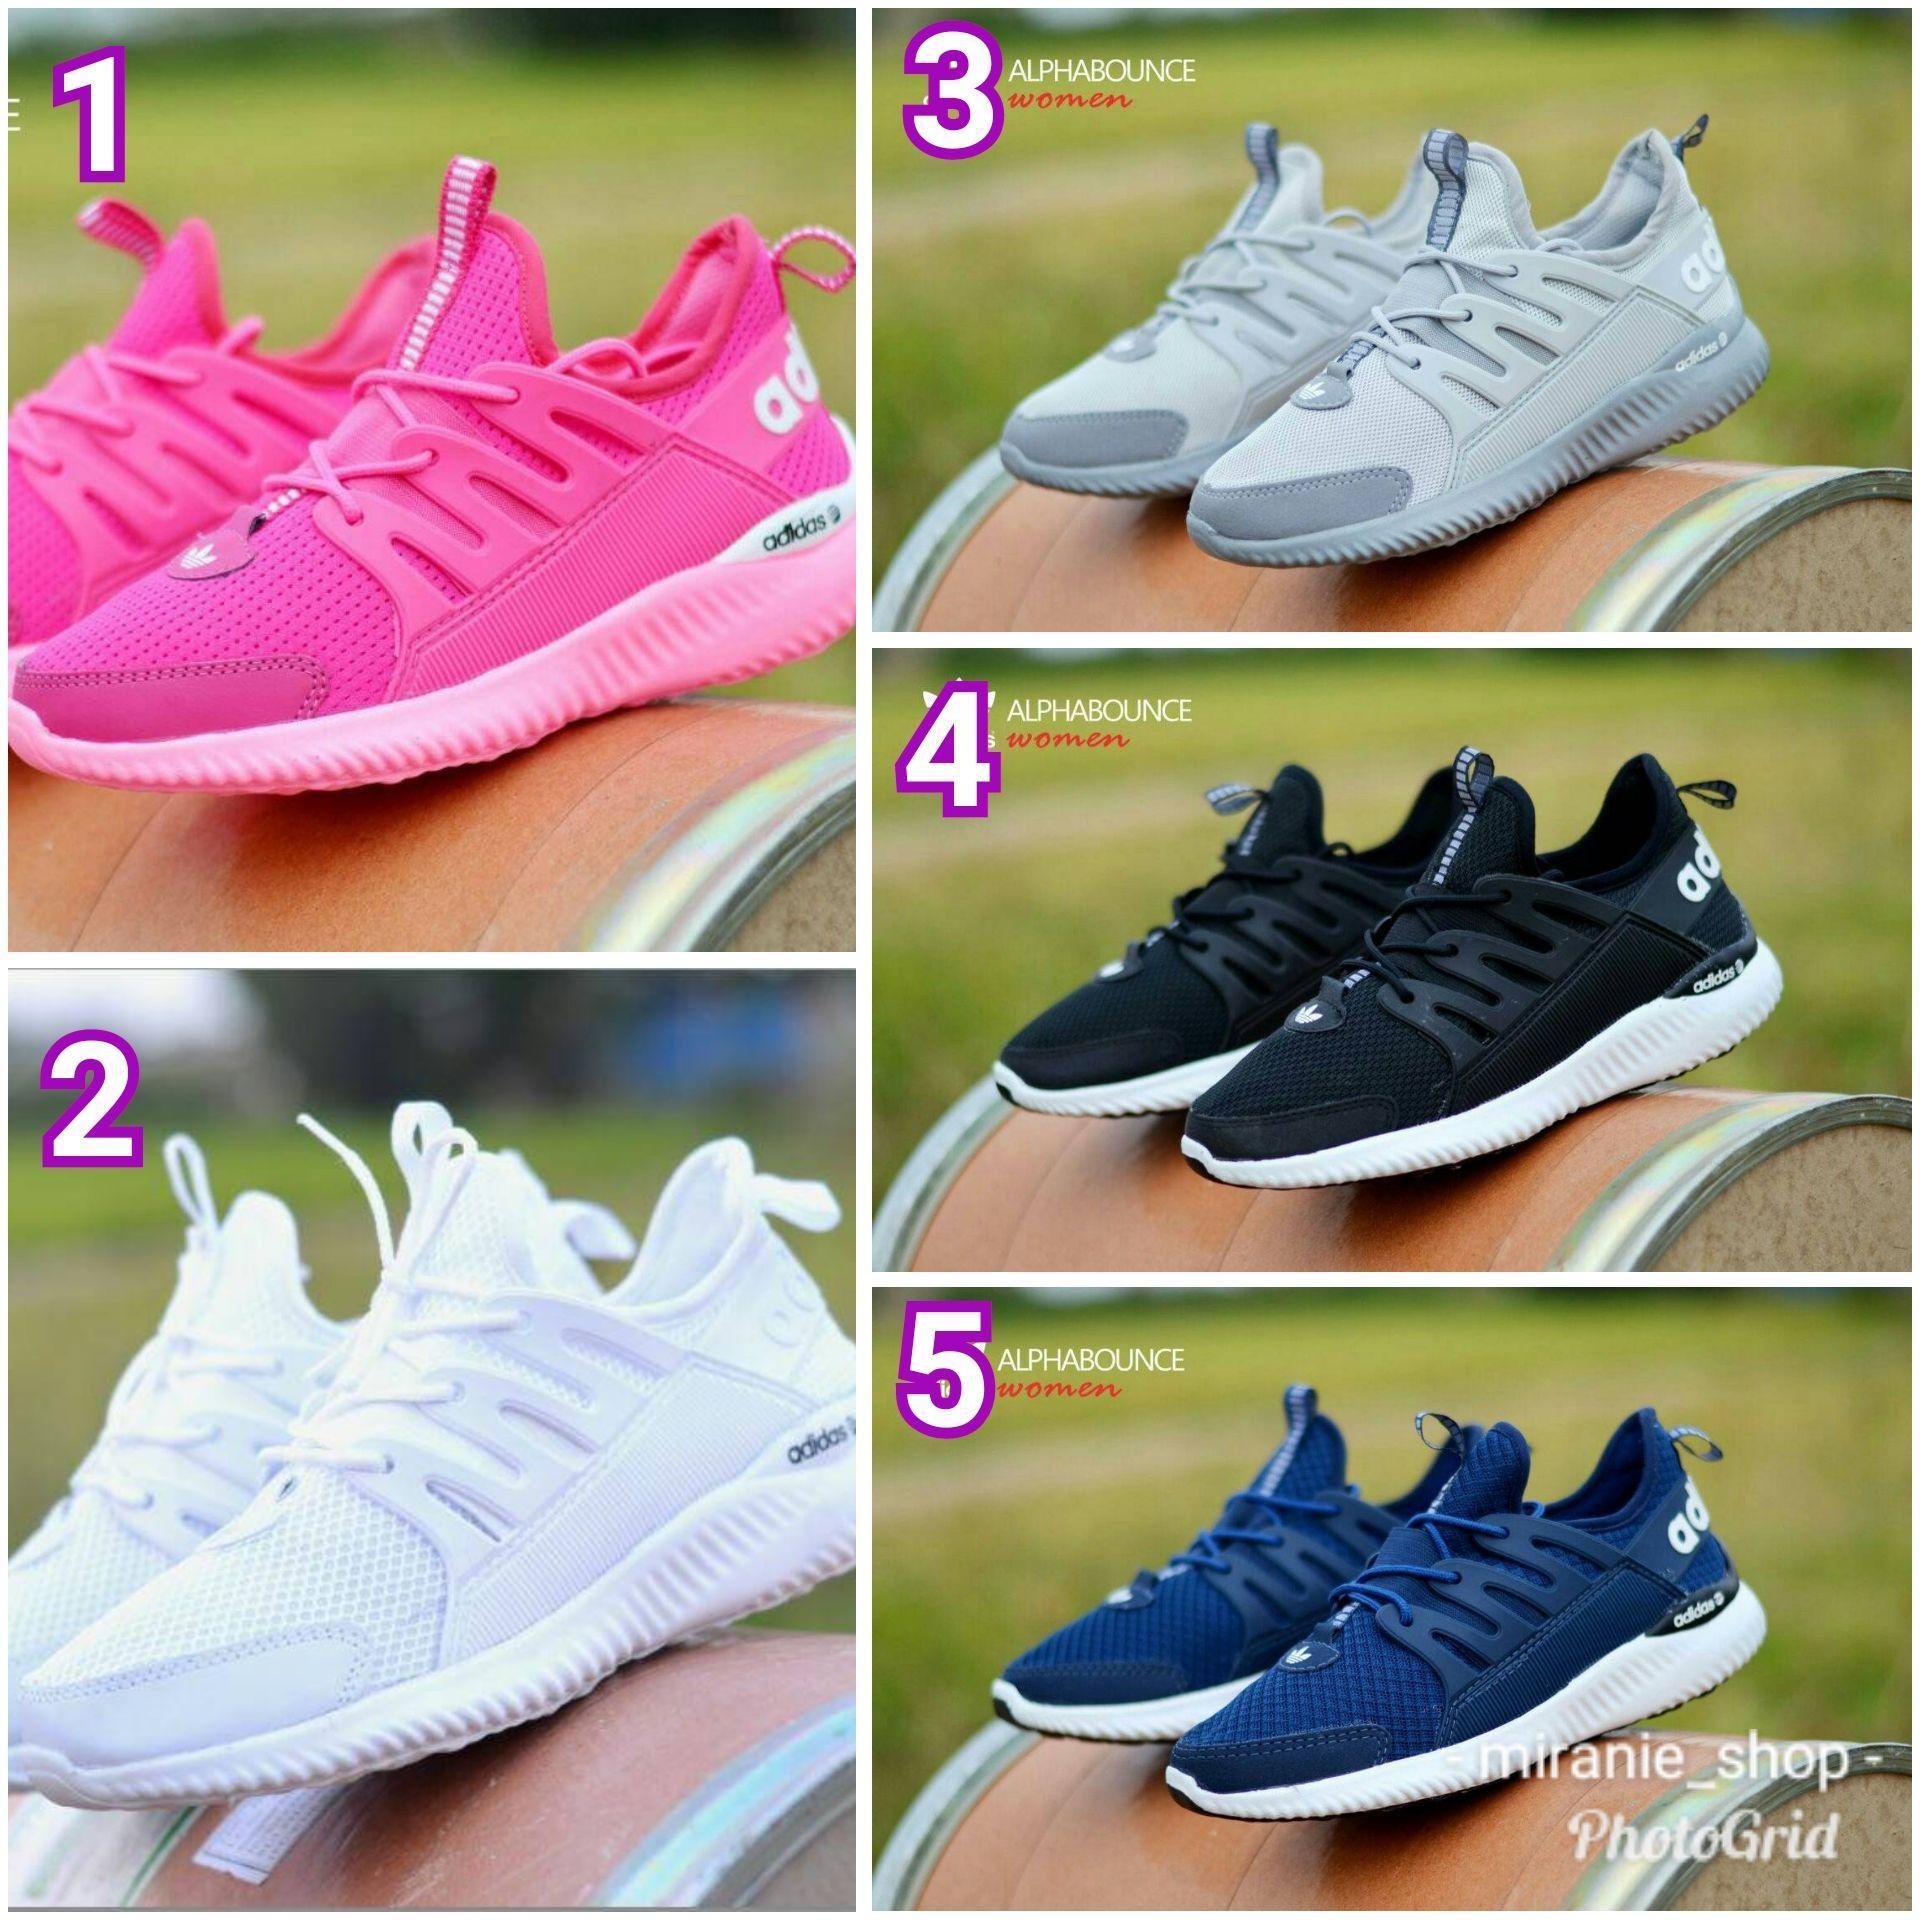 Sepatu Adidas Alphabounce size 36-40 Sepatu Wedges Wanita Import